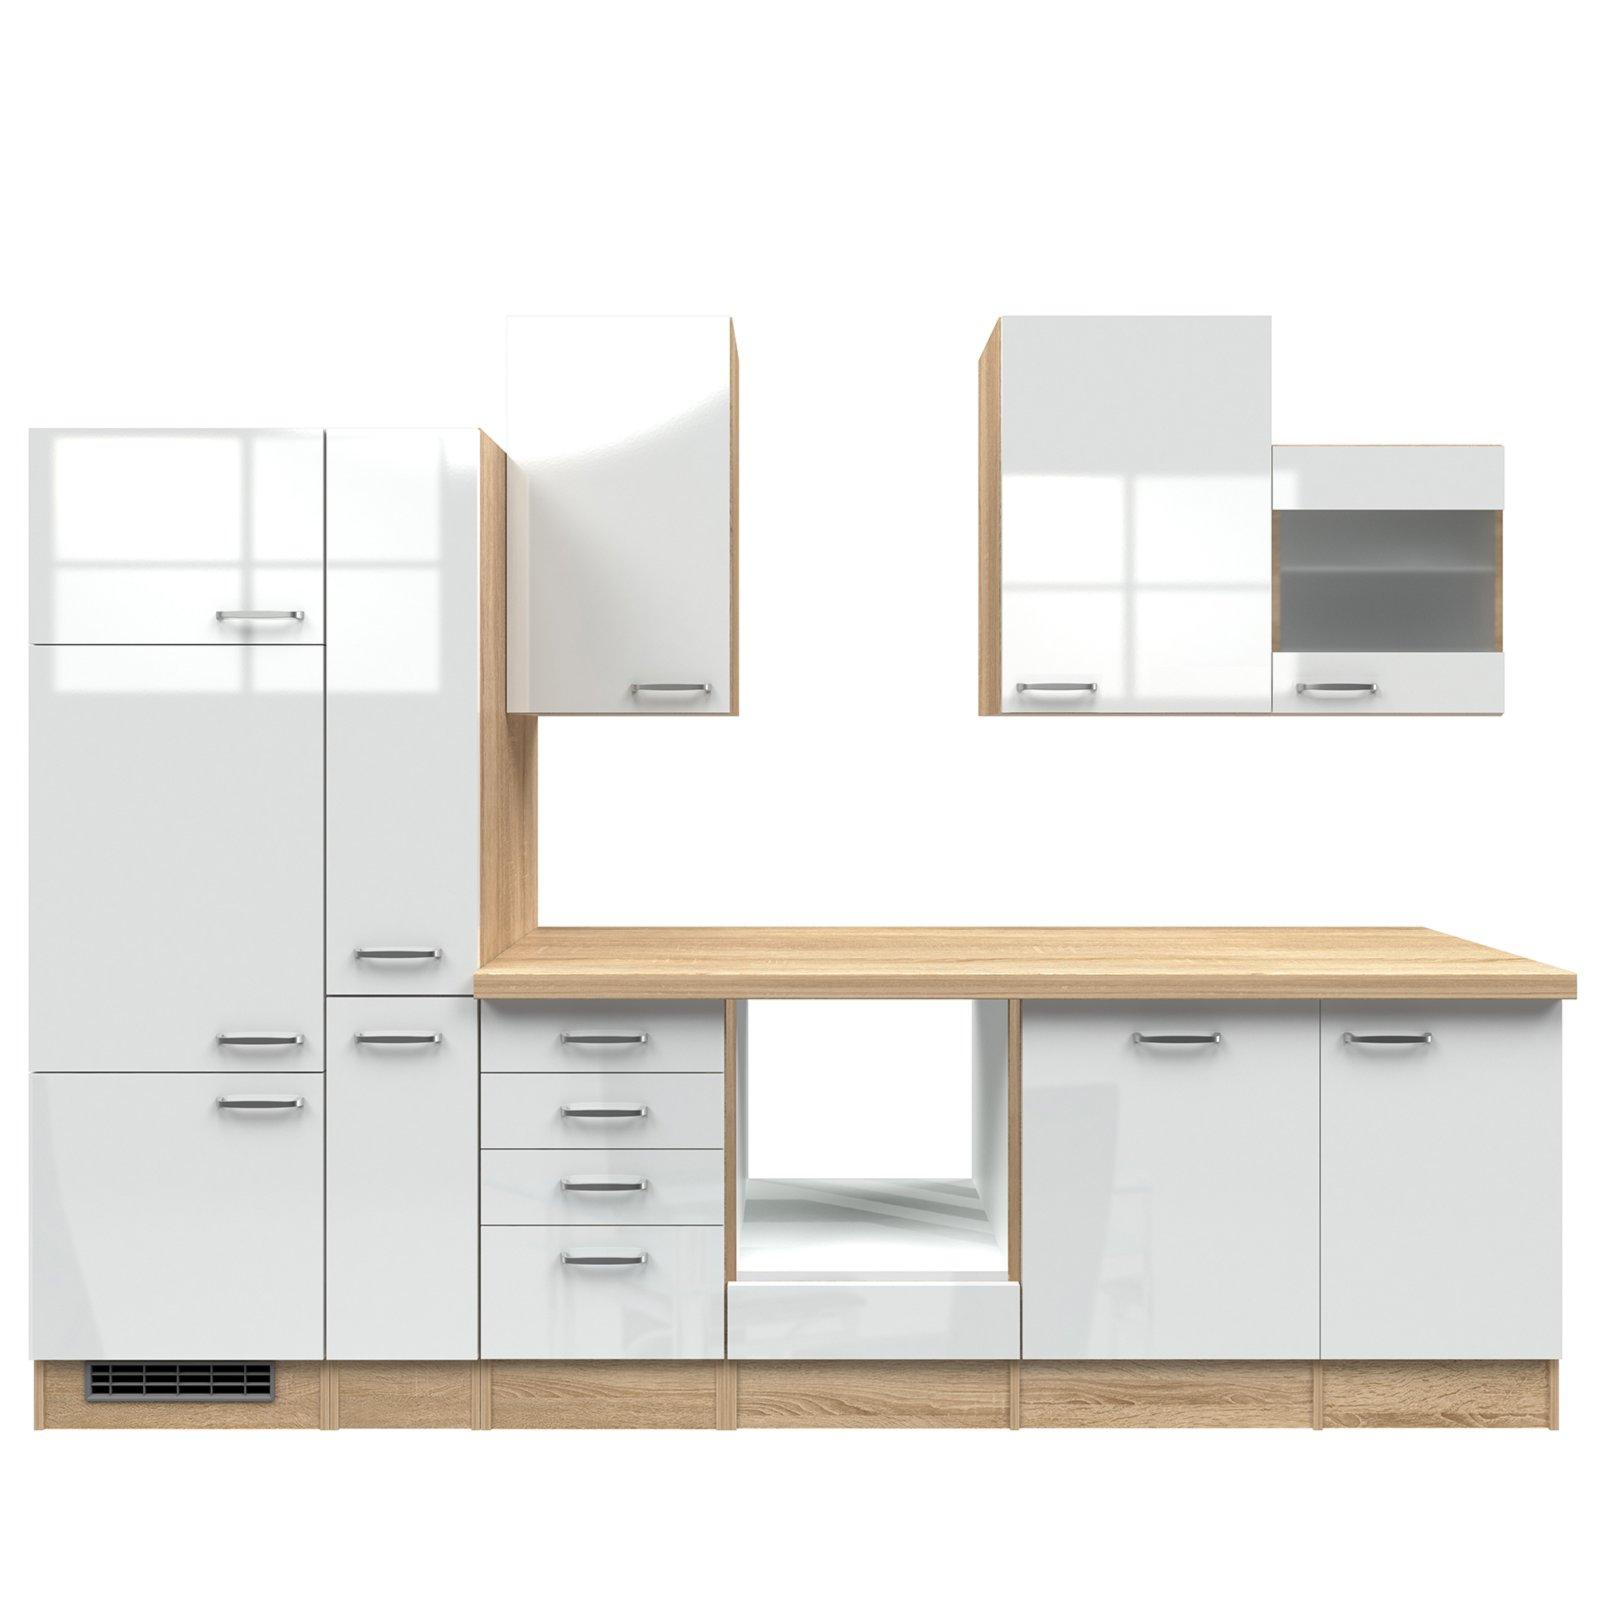 k chenblock valero wei hochglanz sonoma eiche 310 cm k chenzeilen ohne e ger te. Black Bedroom Furniture Sets. Home Design Ideas